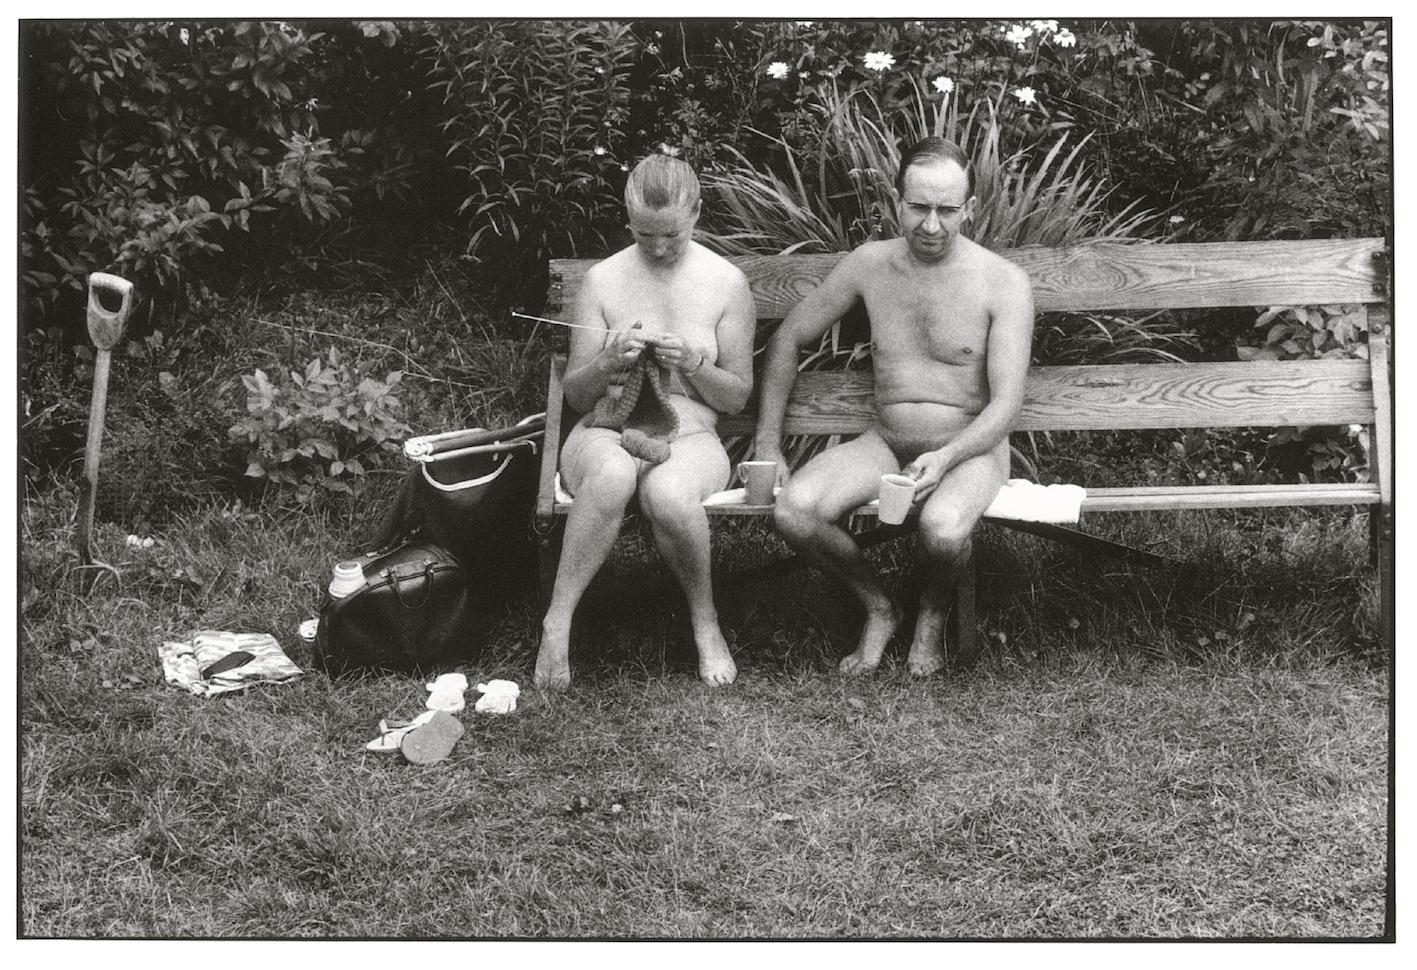 Kent, Inghilterra, 1968. Foto di Elliot Erwitt.